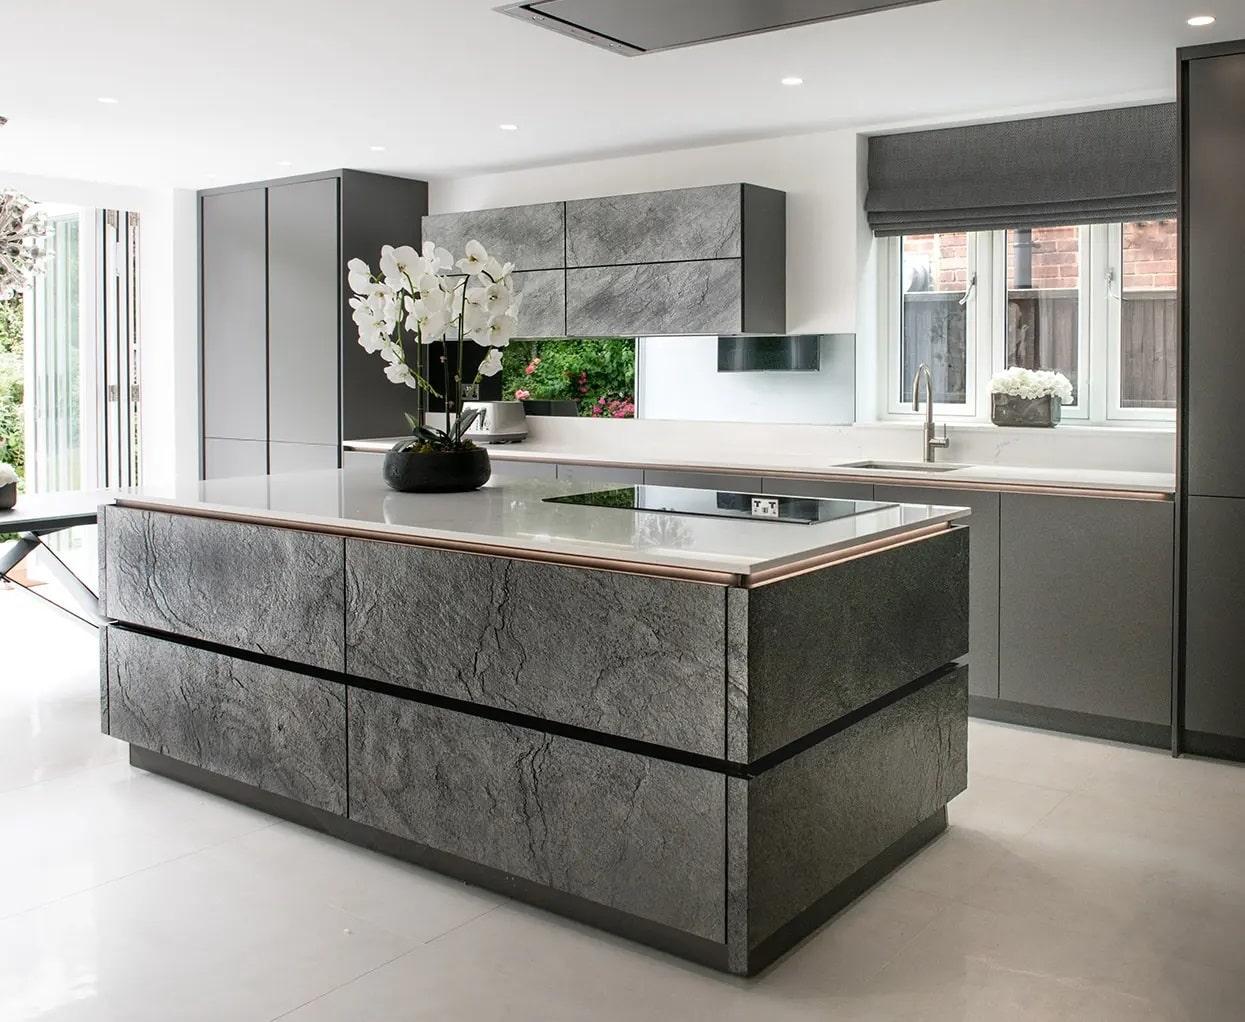 Kitchen Surfaces